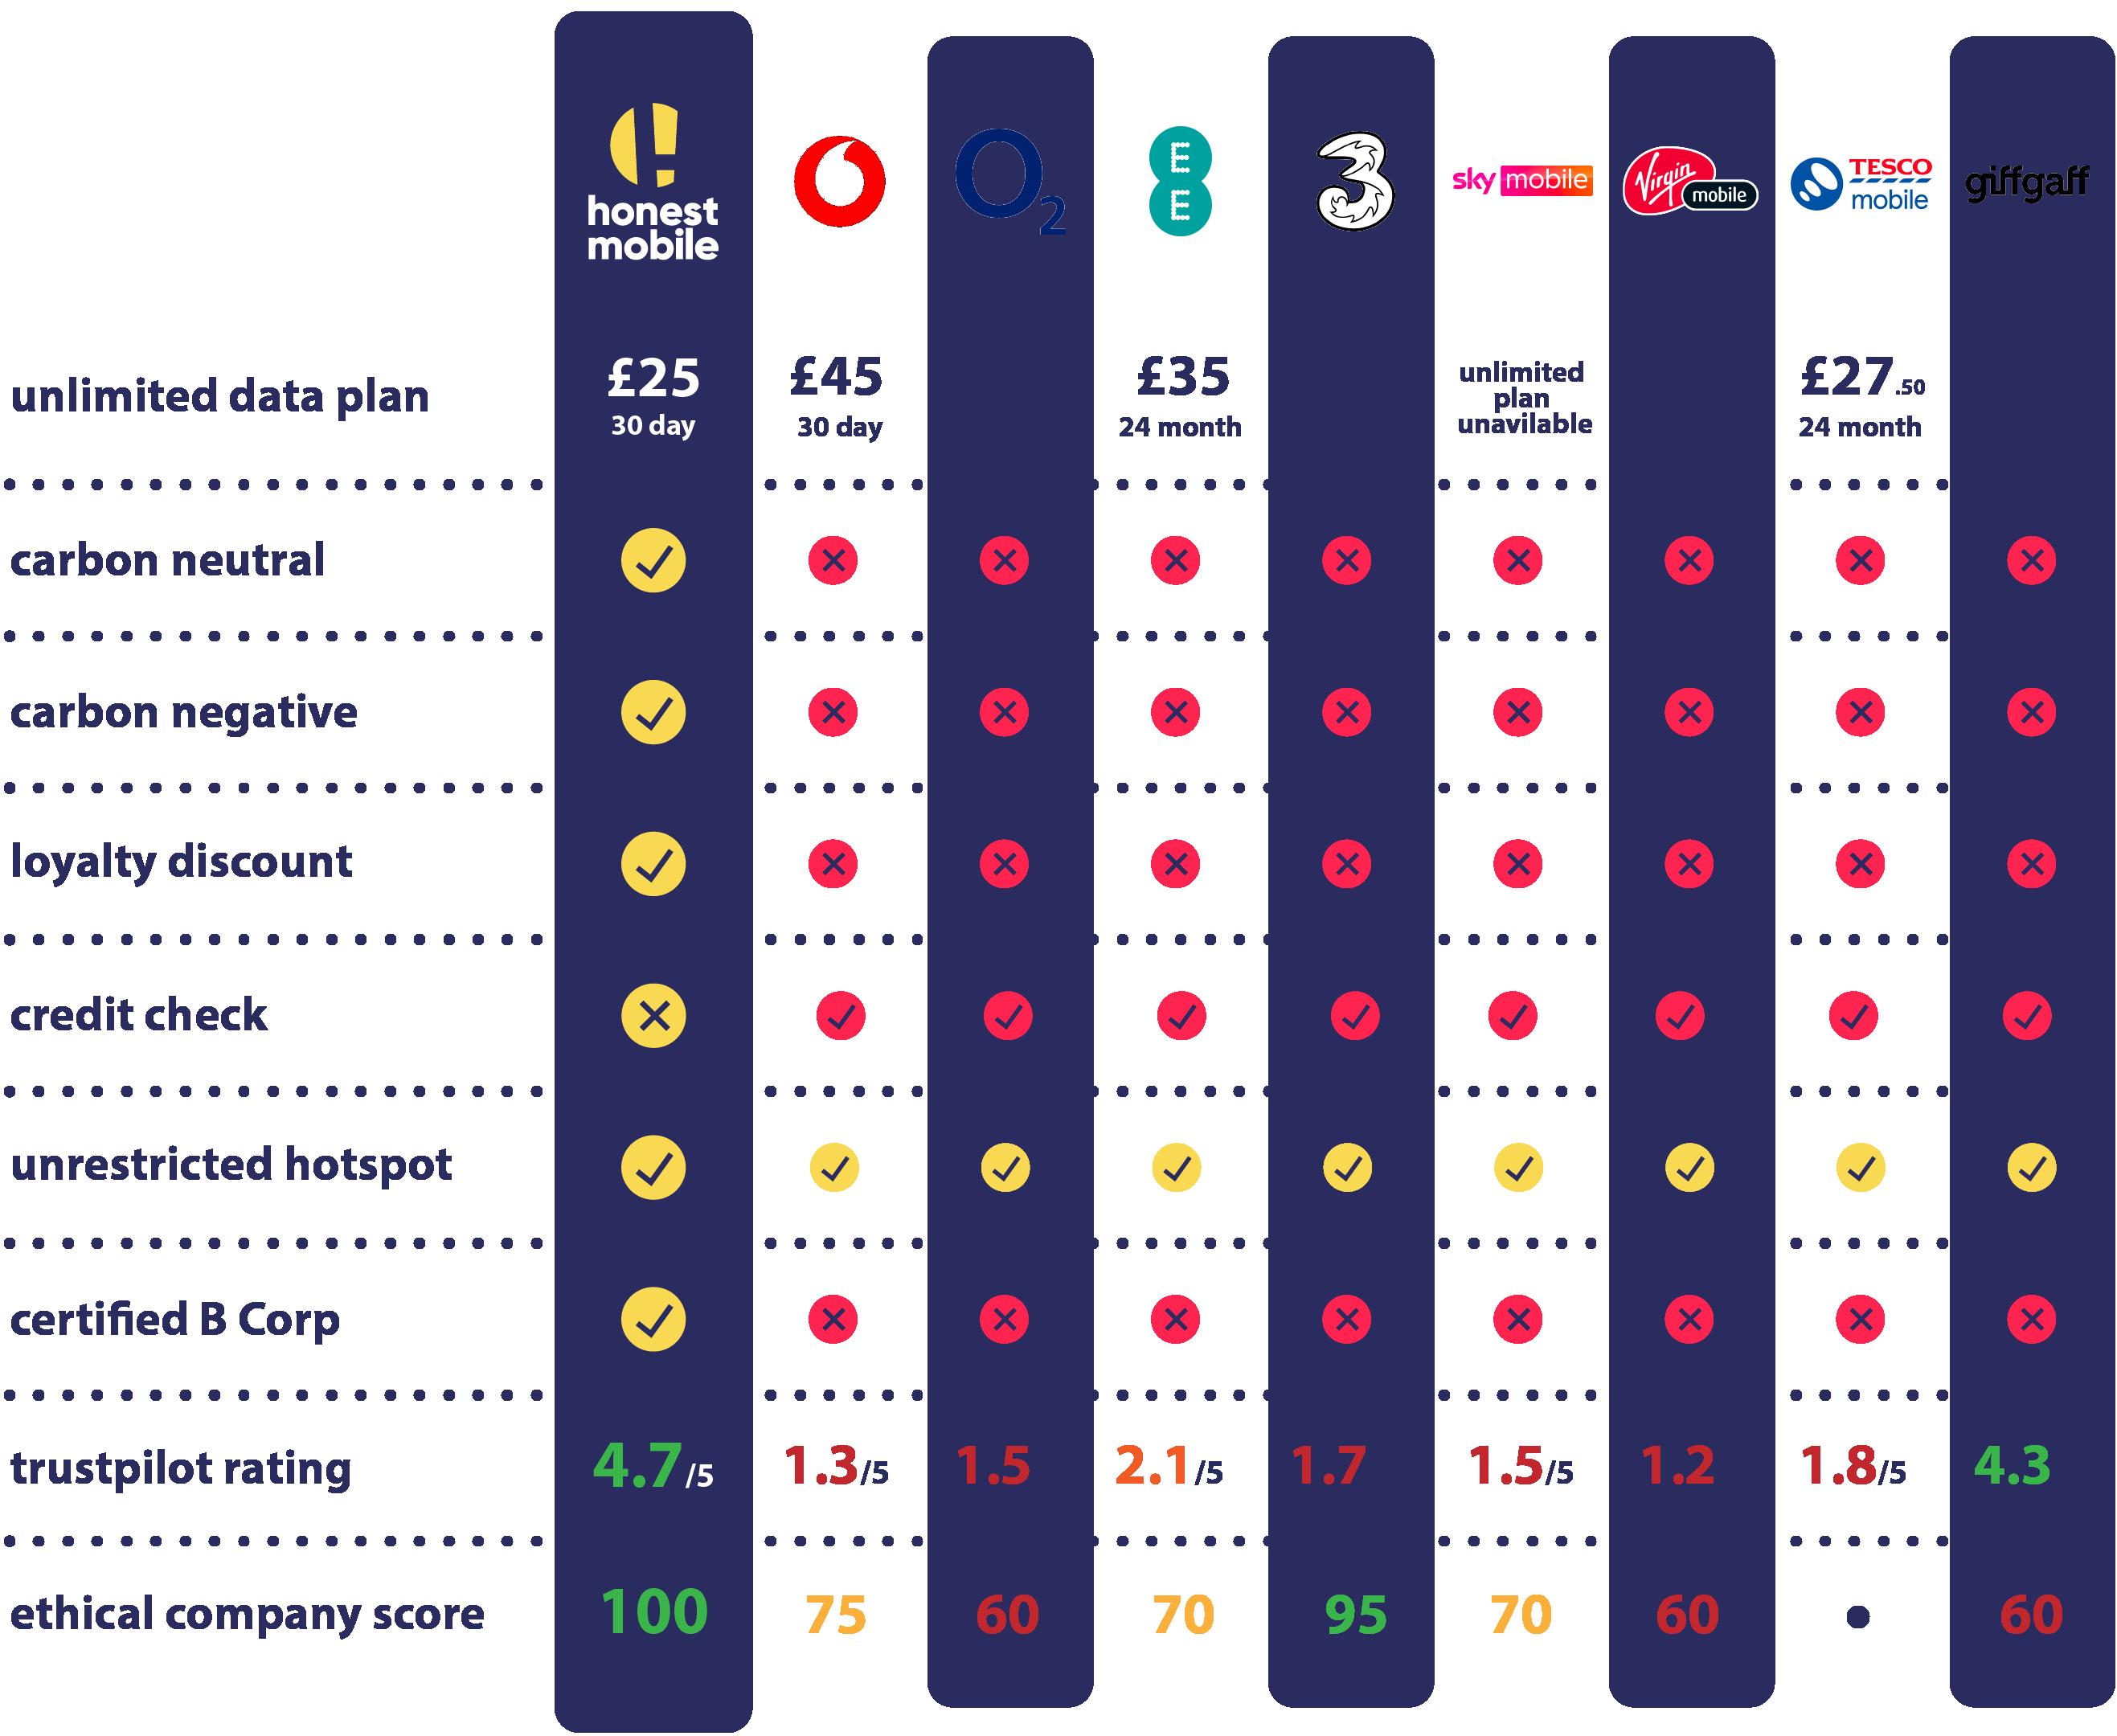 UK Mobile Network Comparison table